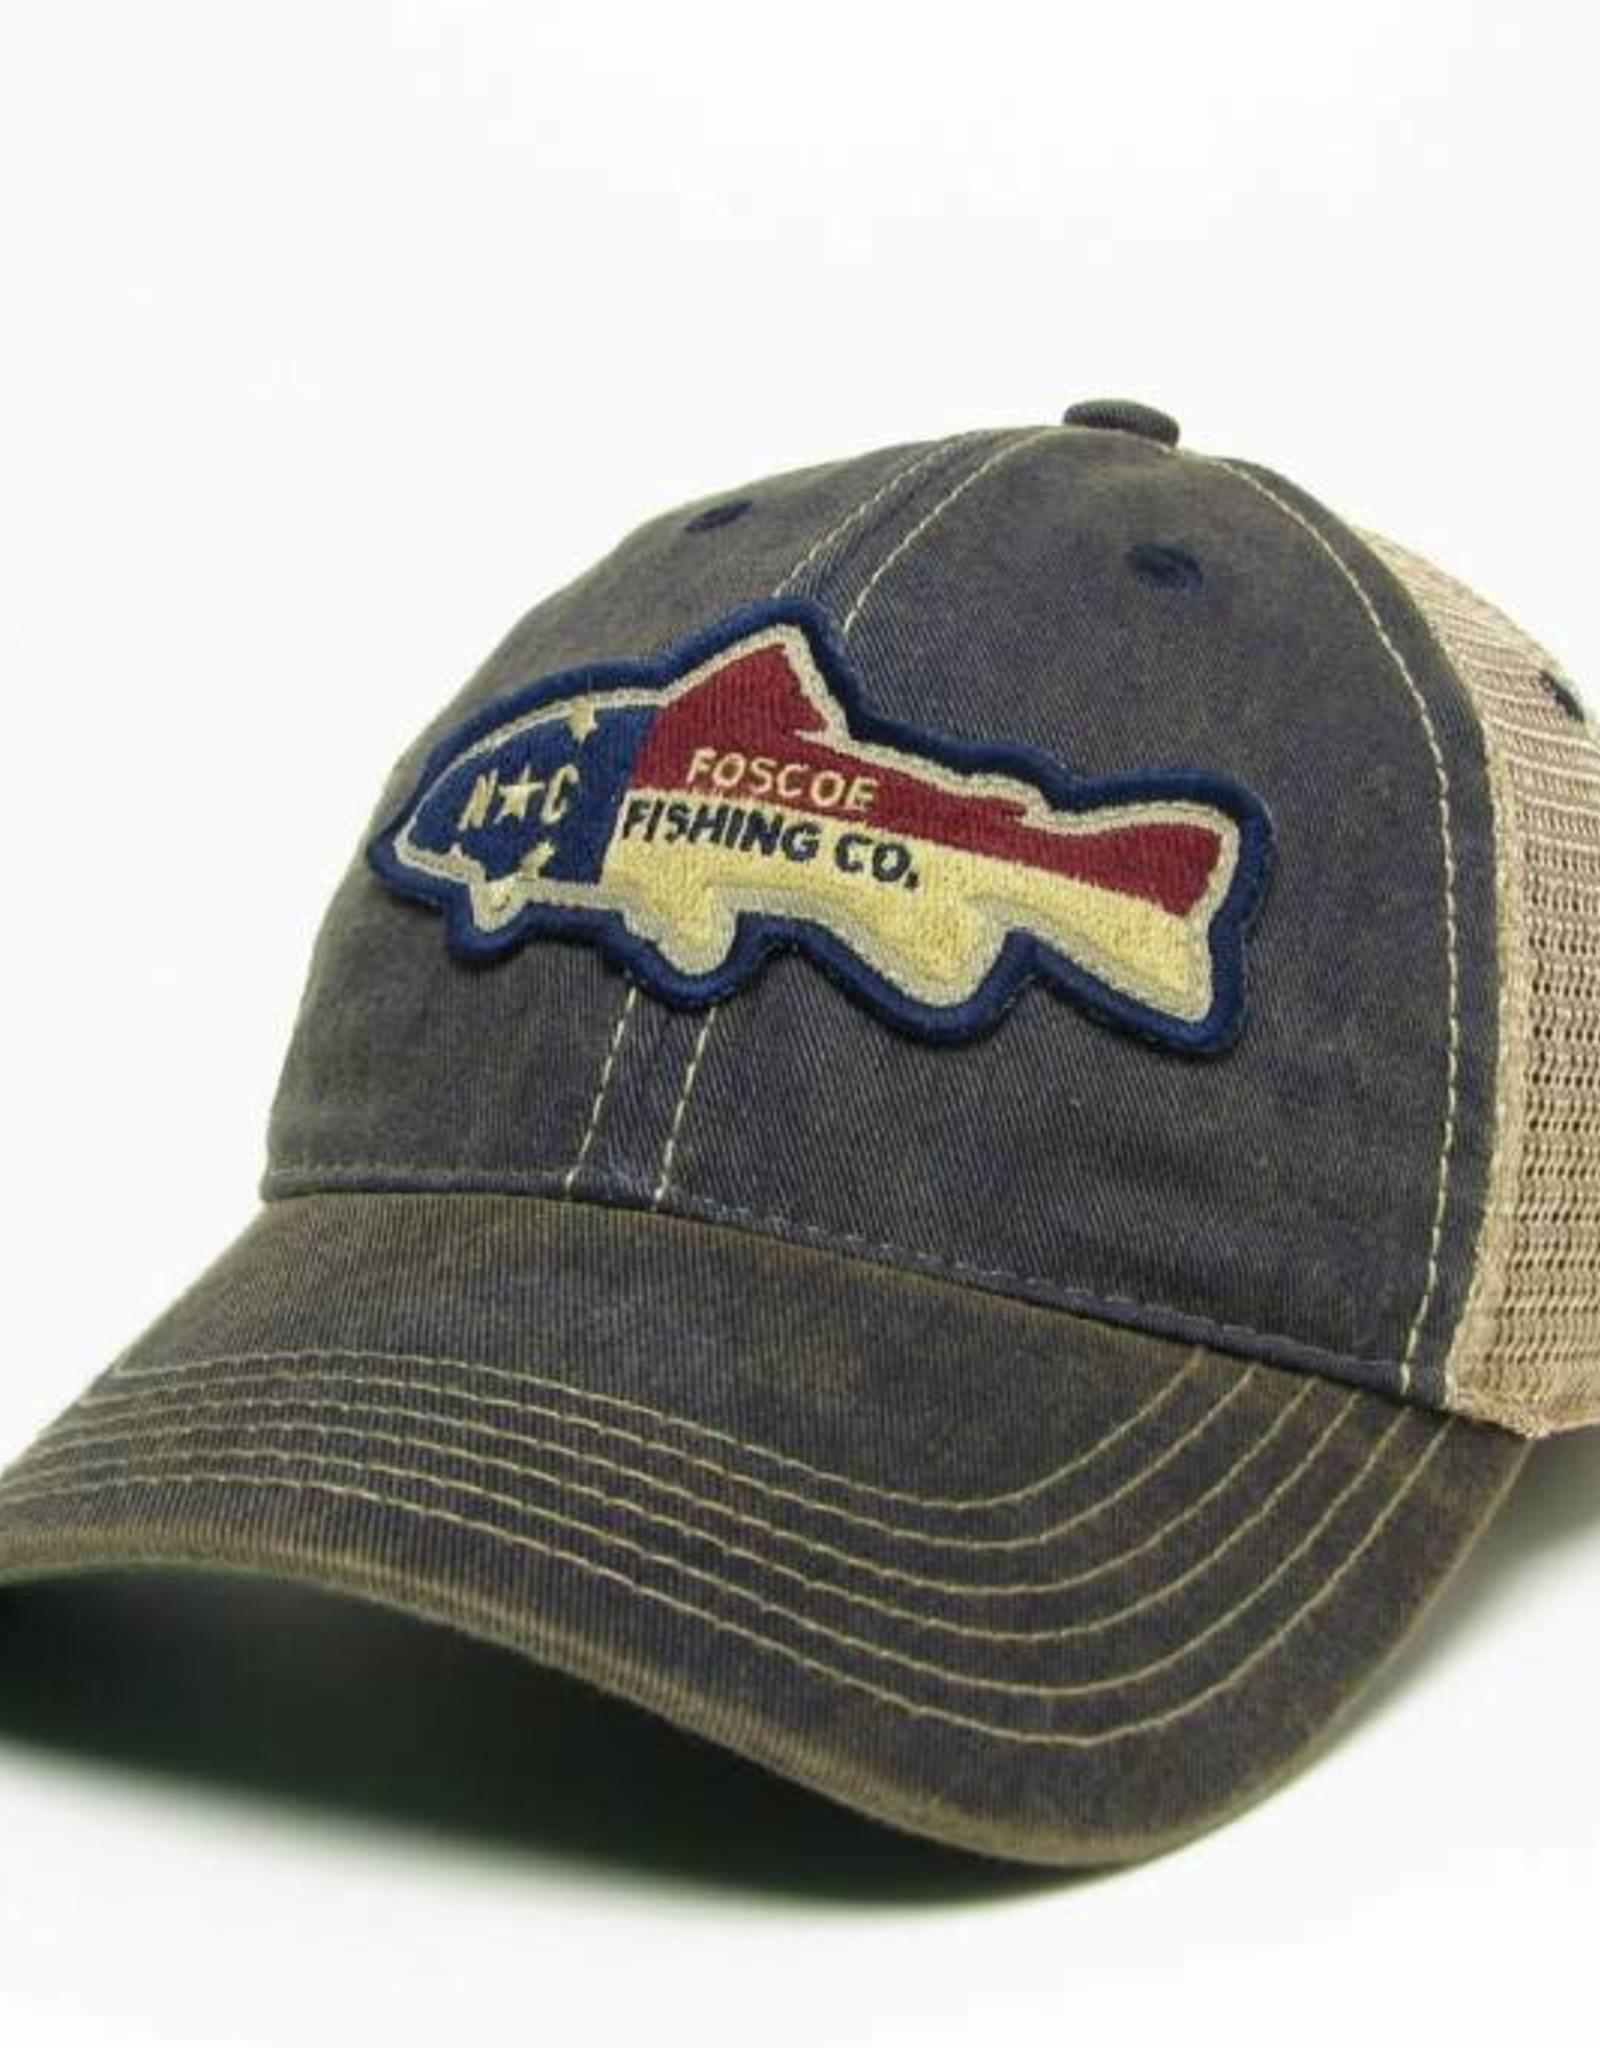 Foscoe Fishing Co. Old Favorite NC Trout Trucker